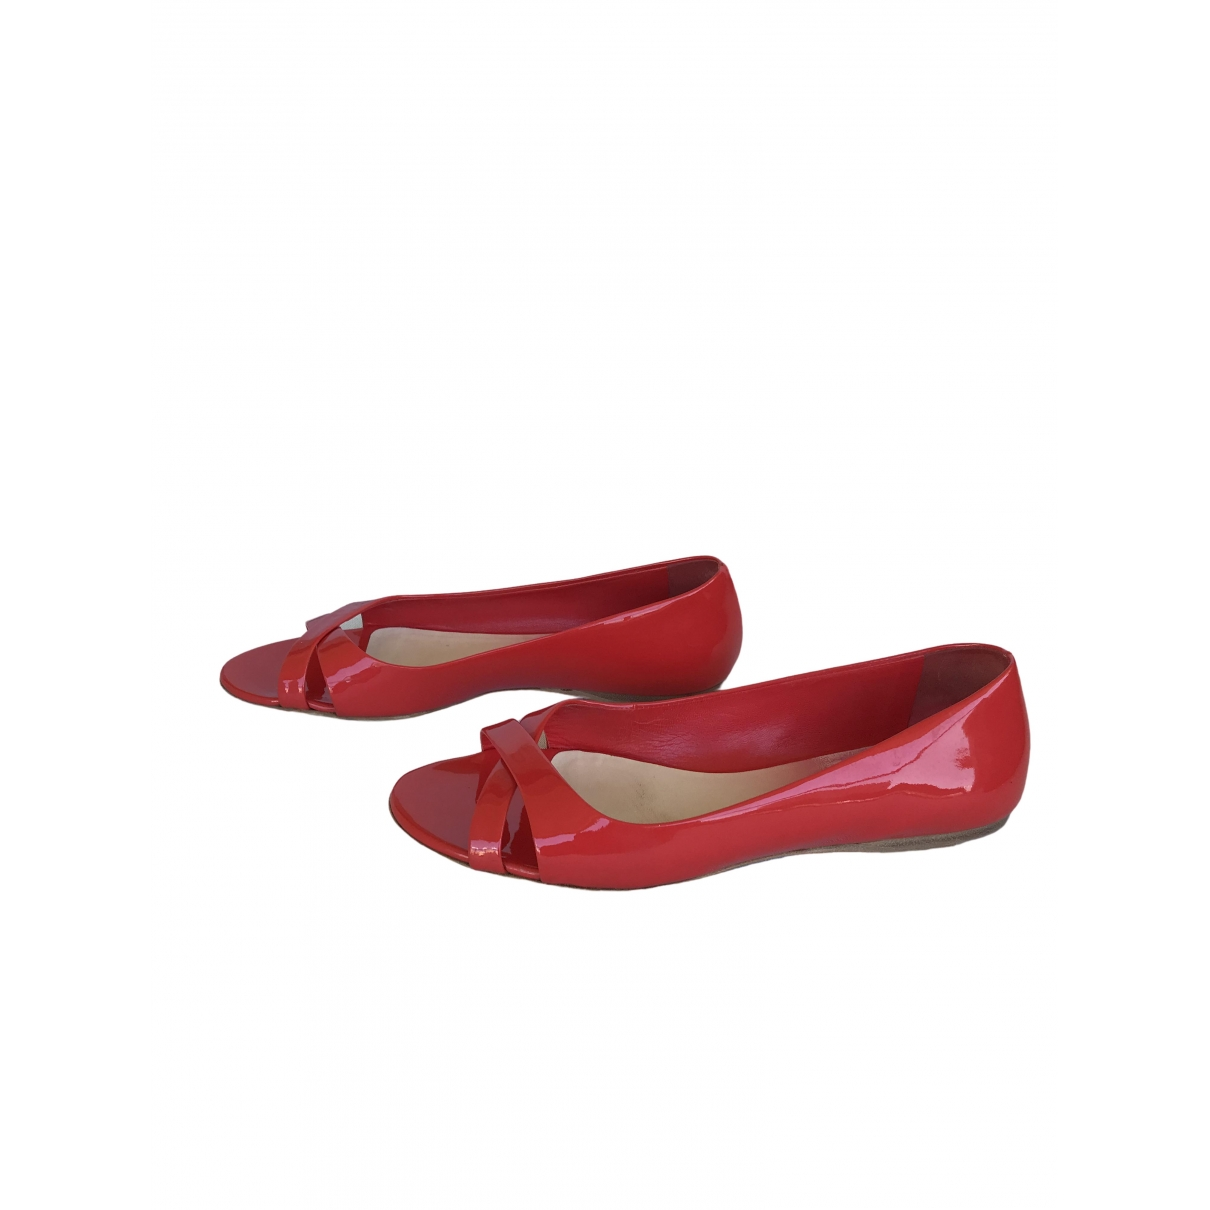 Miu Miu \N Red Patent leather Ballet flats for Women 36.5 EU